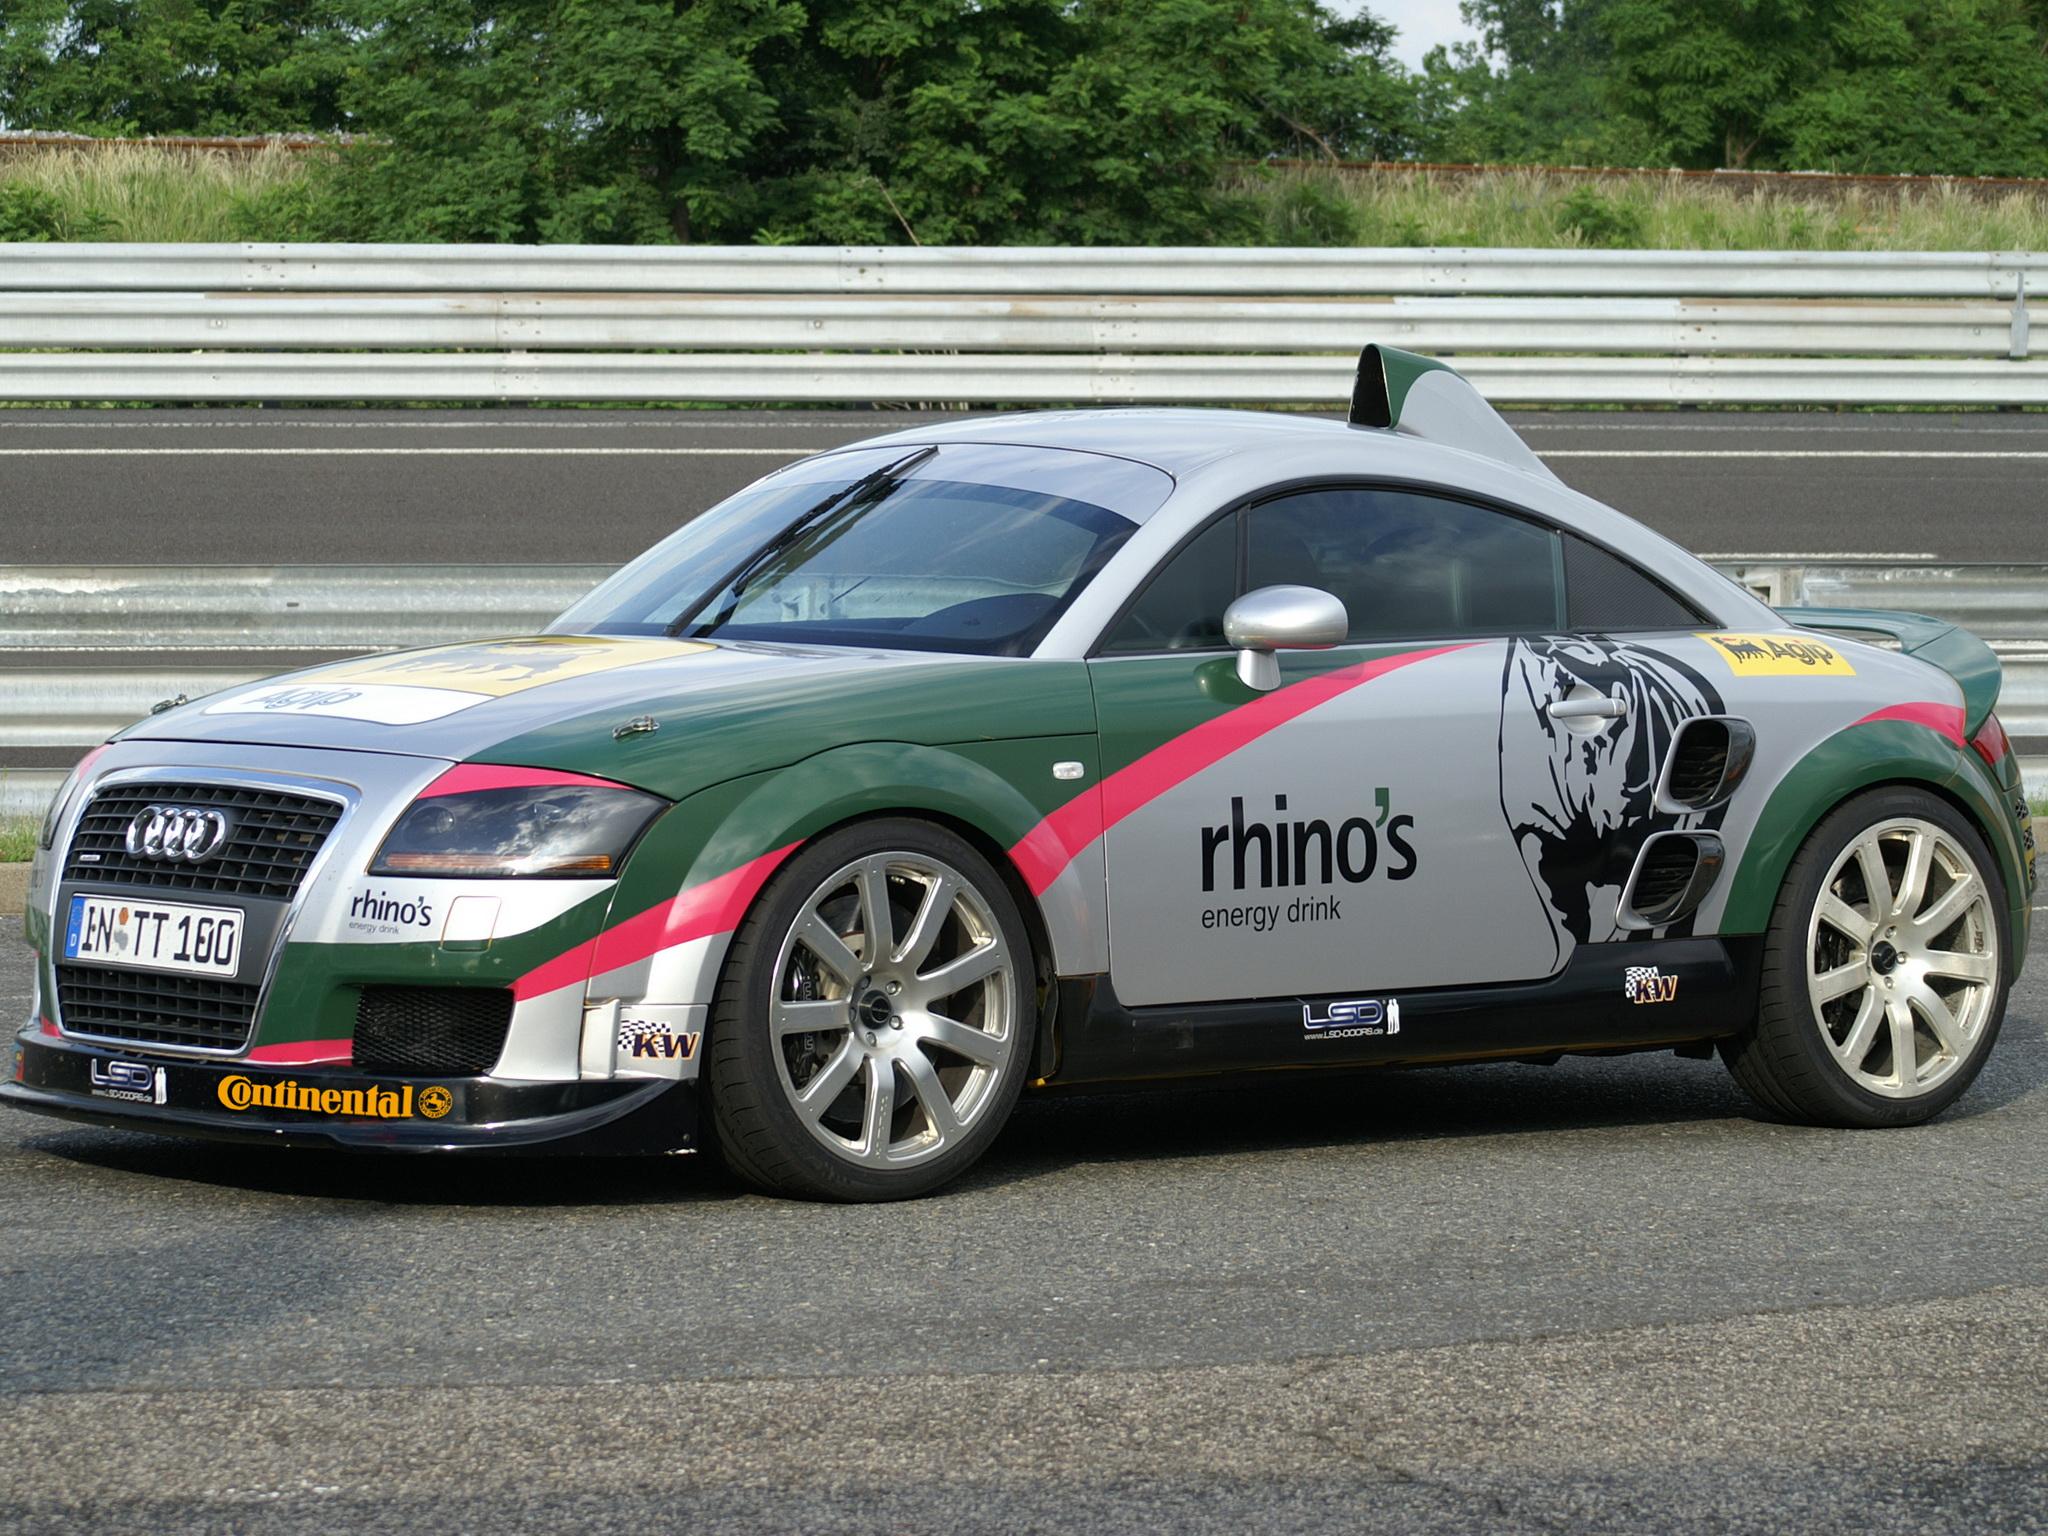 2007 Mtm Audi T T Bimoto Record Car Race Racing Tuning V